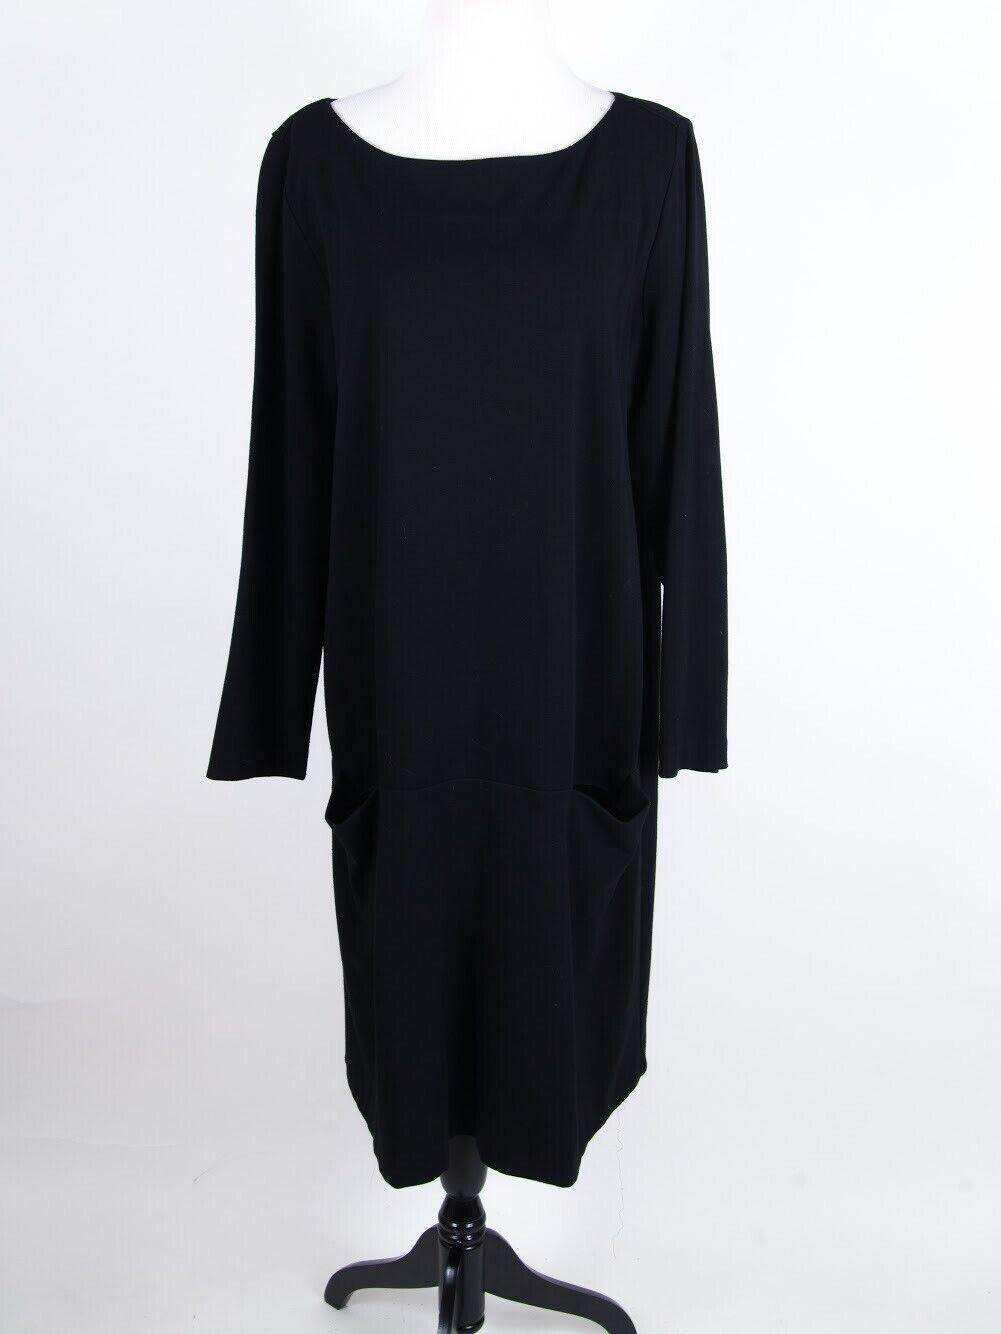 Eileen Fisher schwarz Knee Length Stretch Long Sleeve Shift Dress